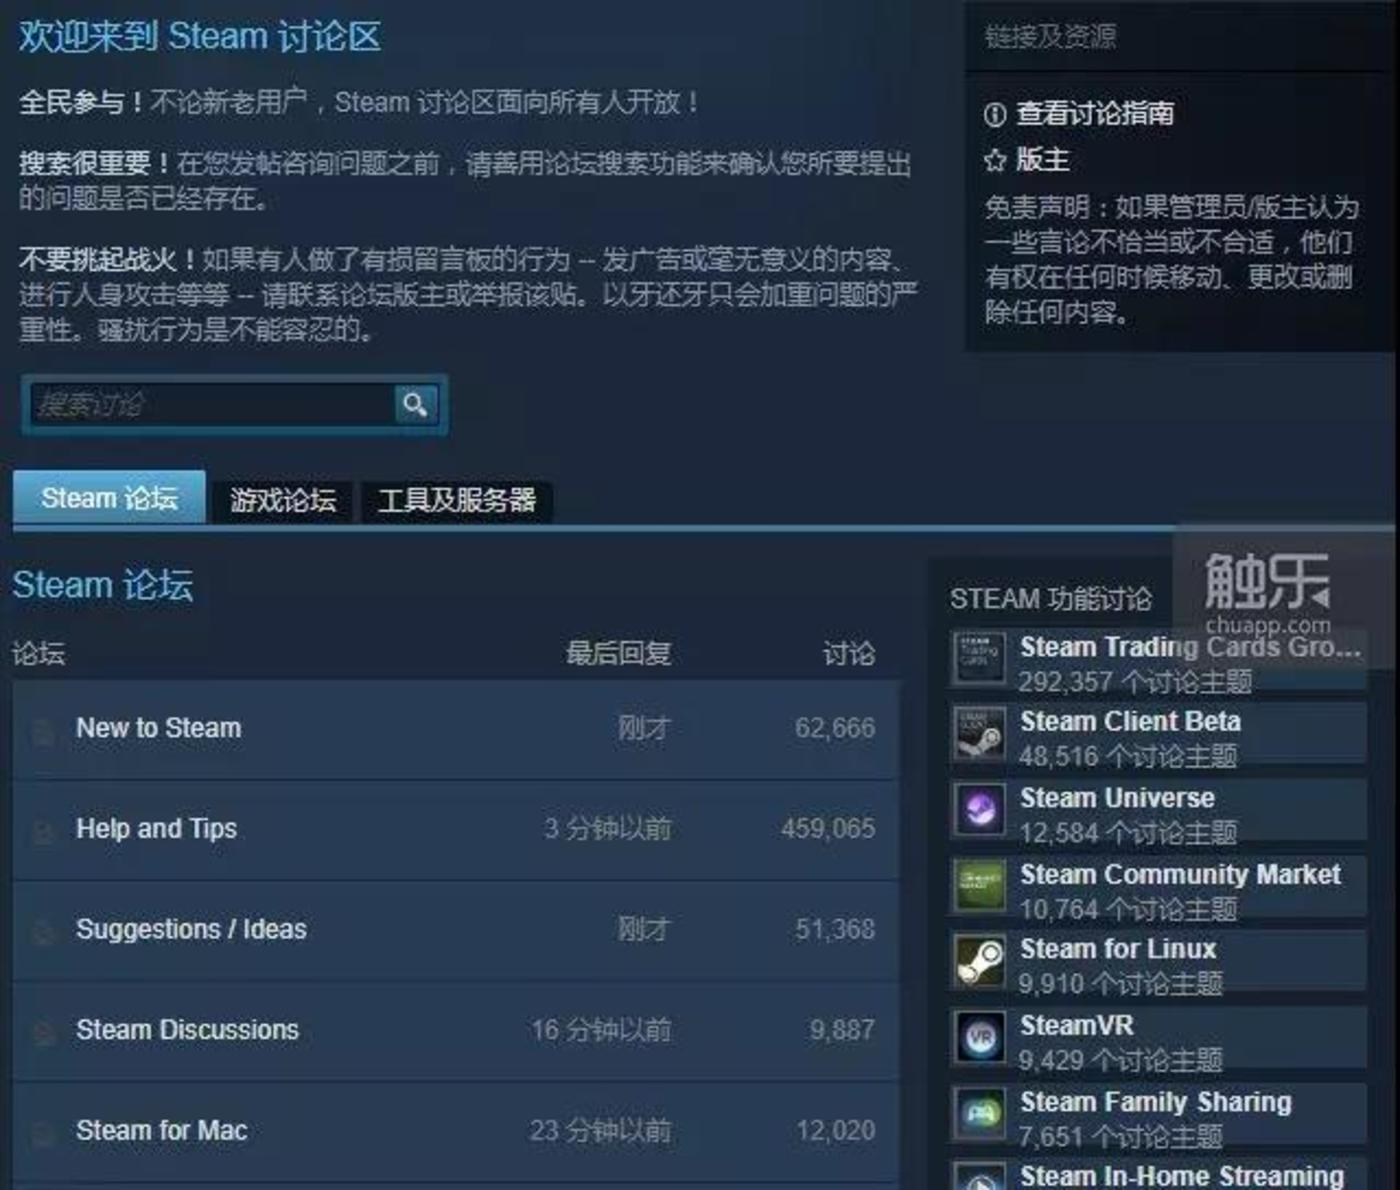 Steam为每个游戏都内置了论坛、攻略等专区